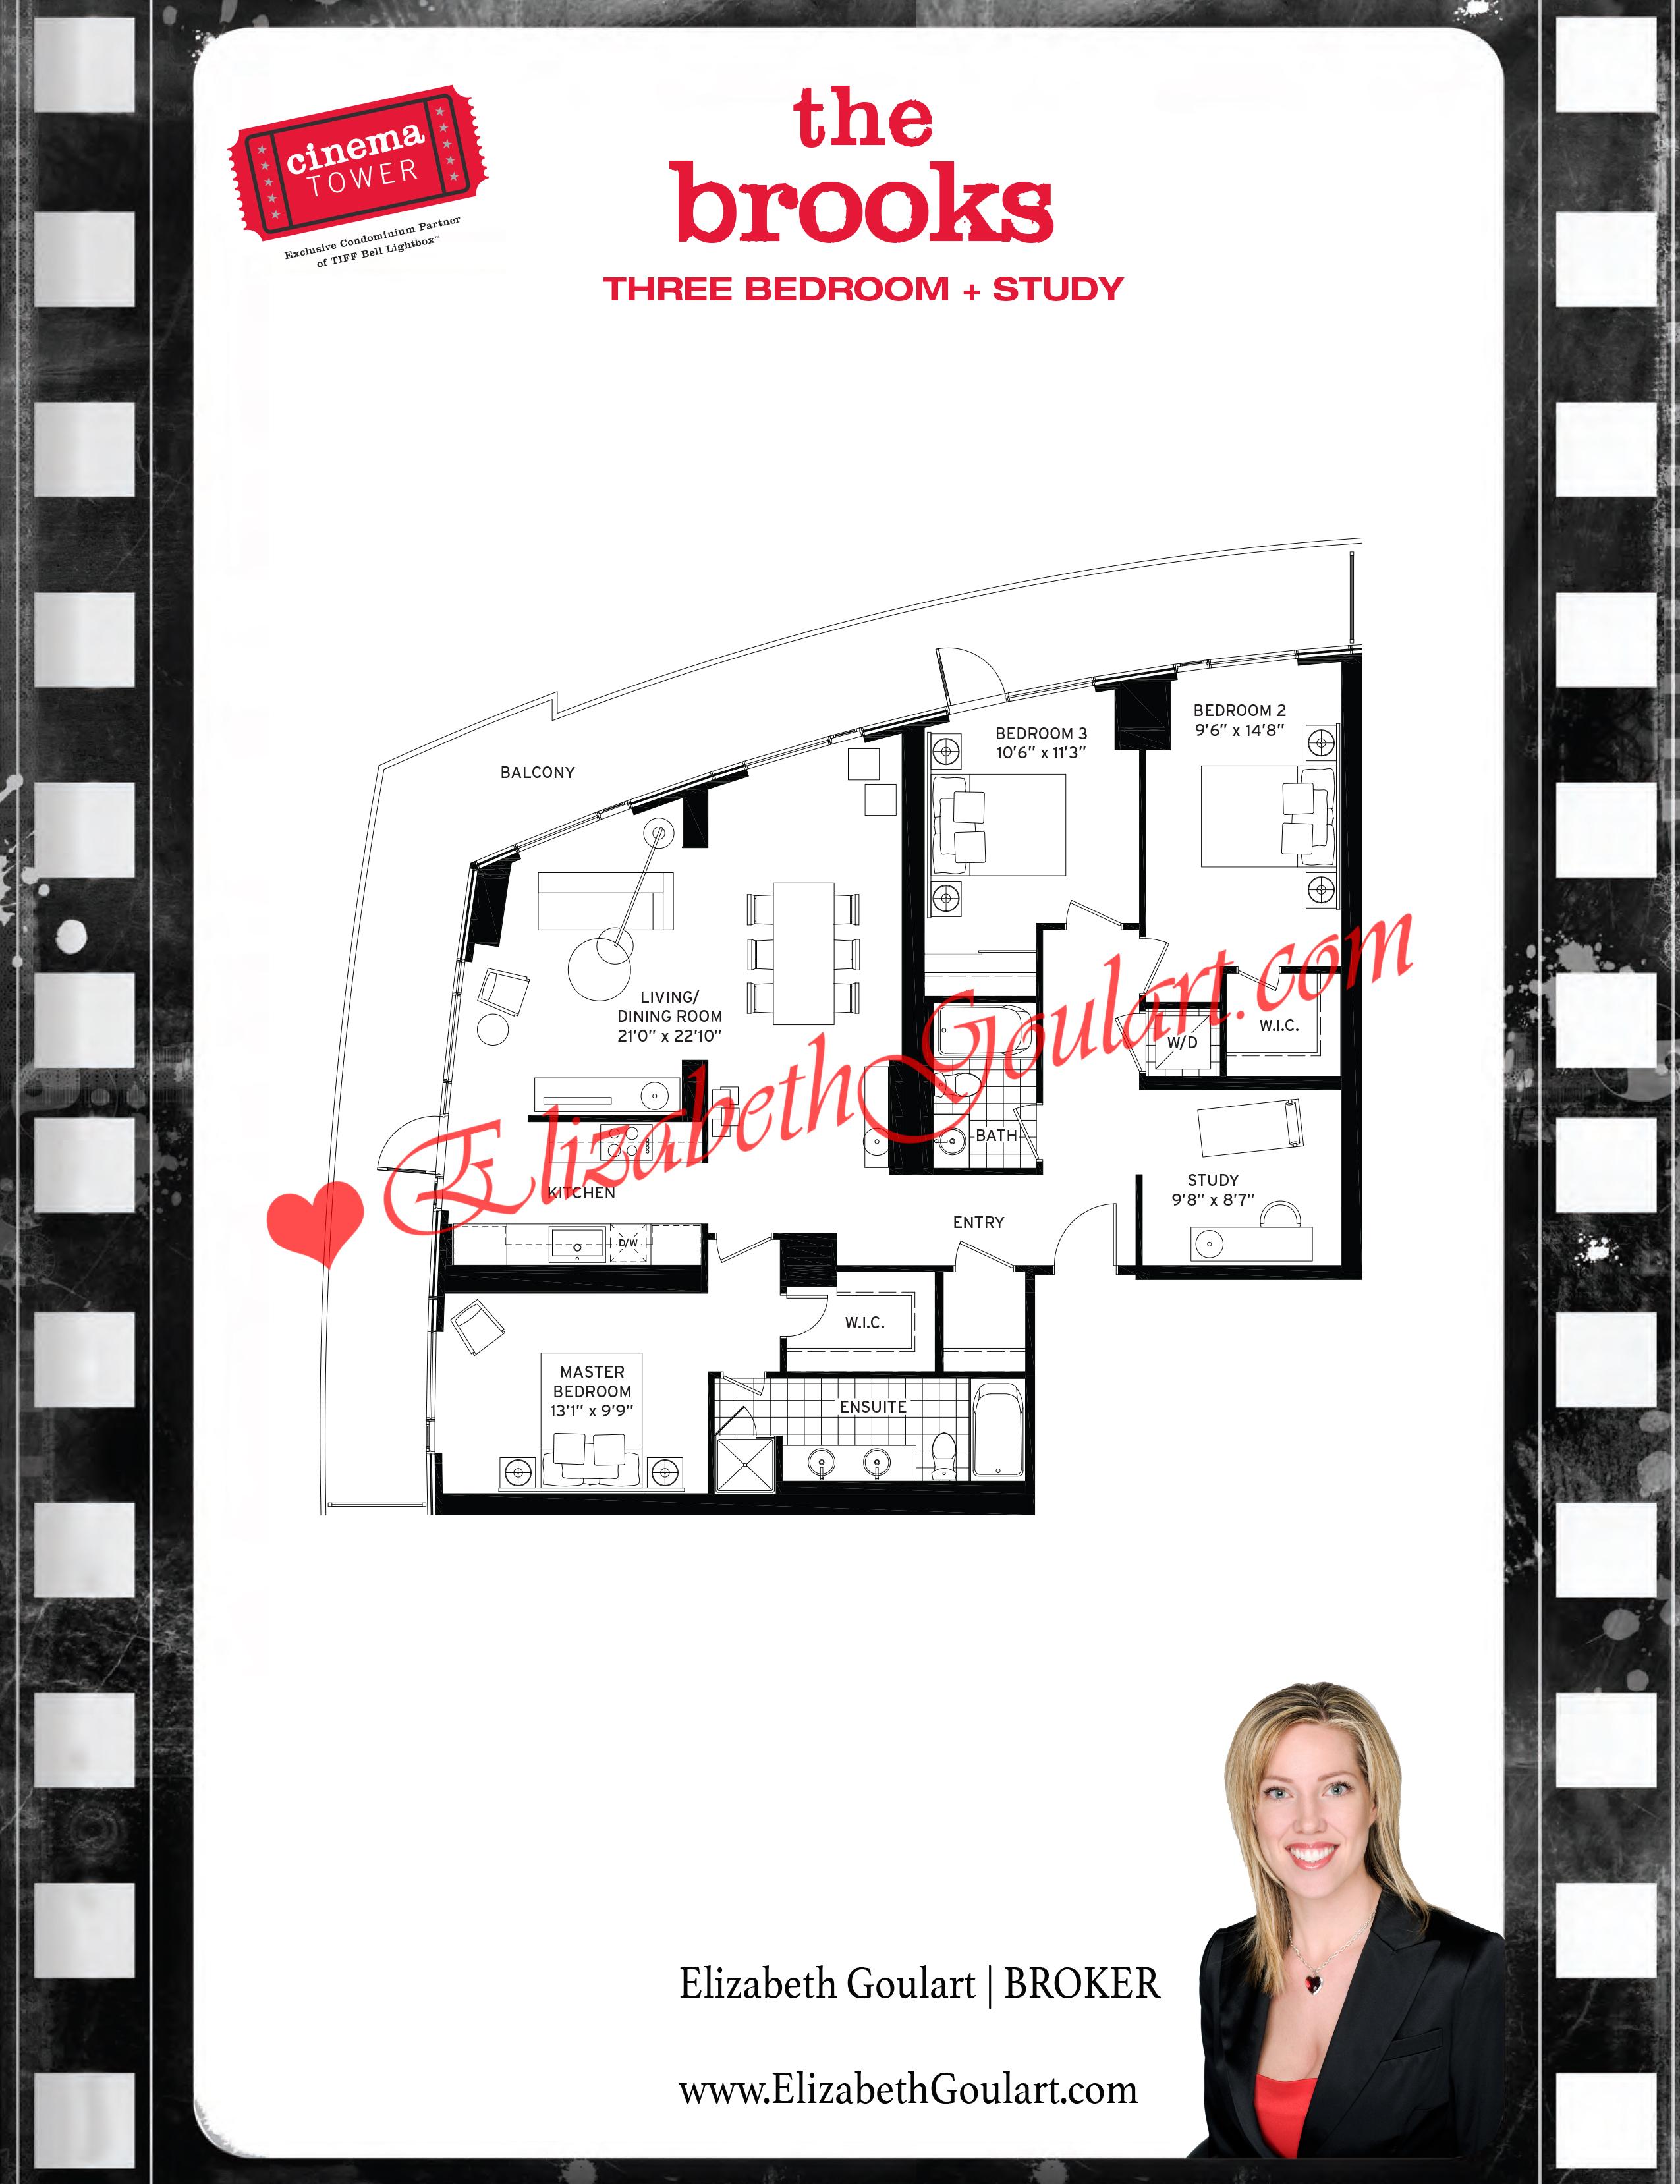 21 Widmer Street Cinema Tower Condominiums For Sale Rent Elizabeth Goulart Broker